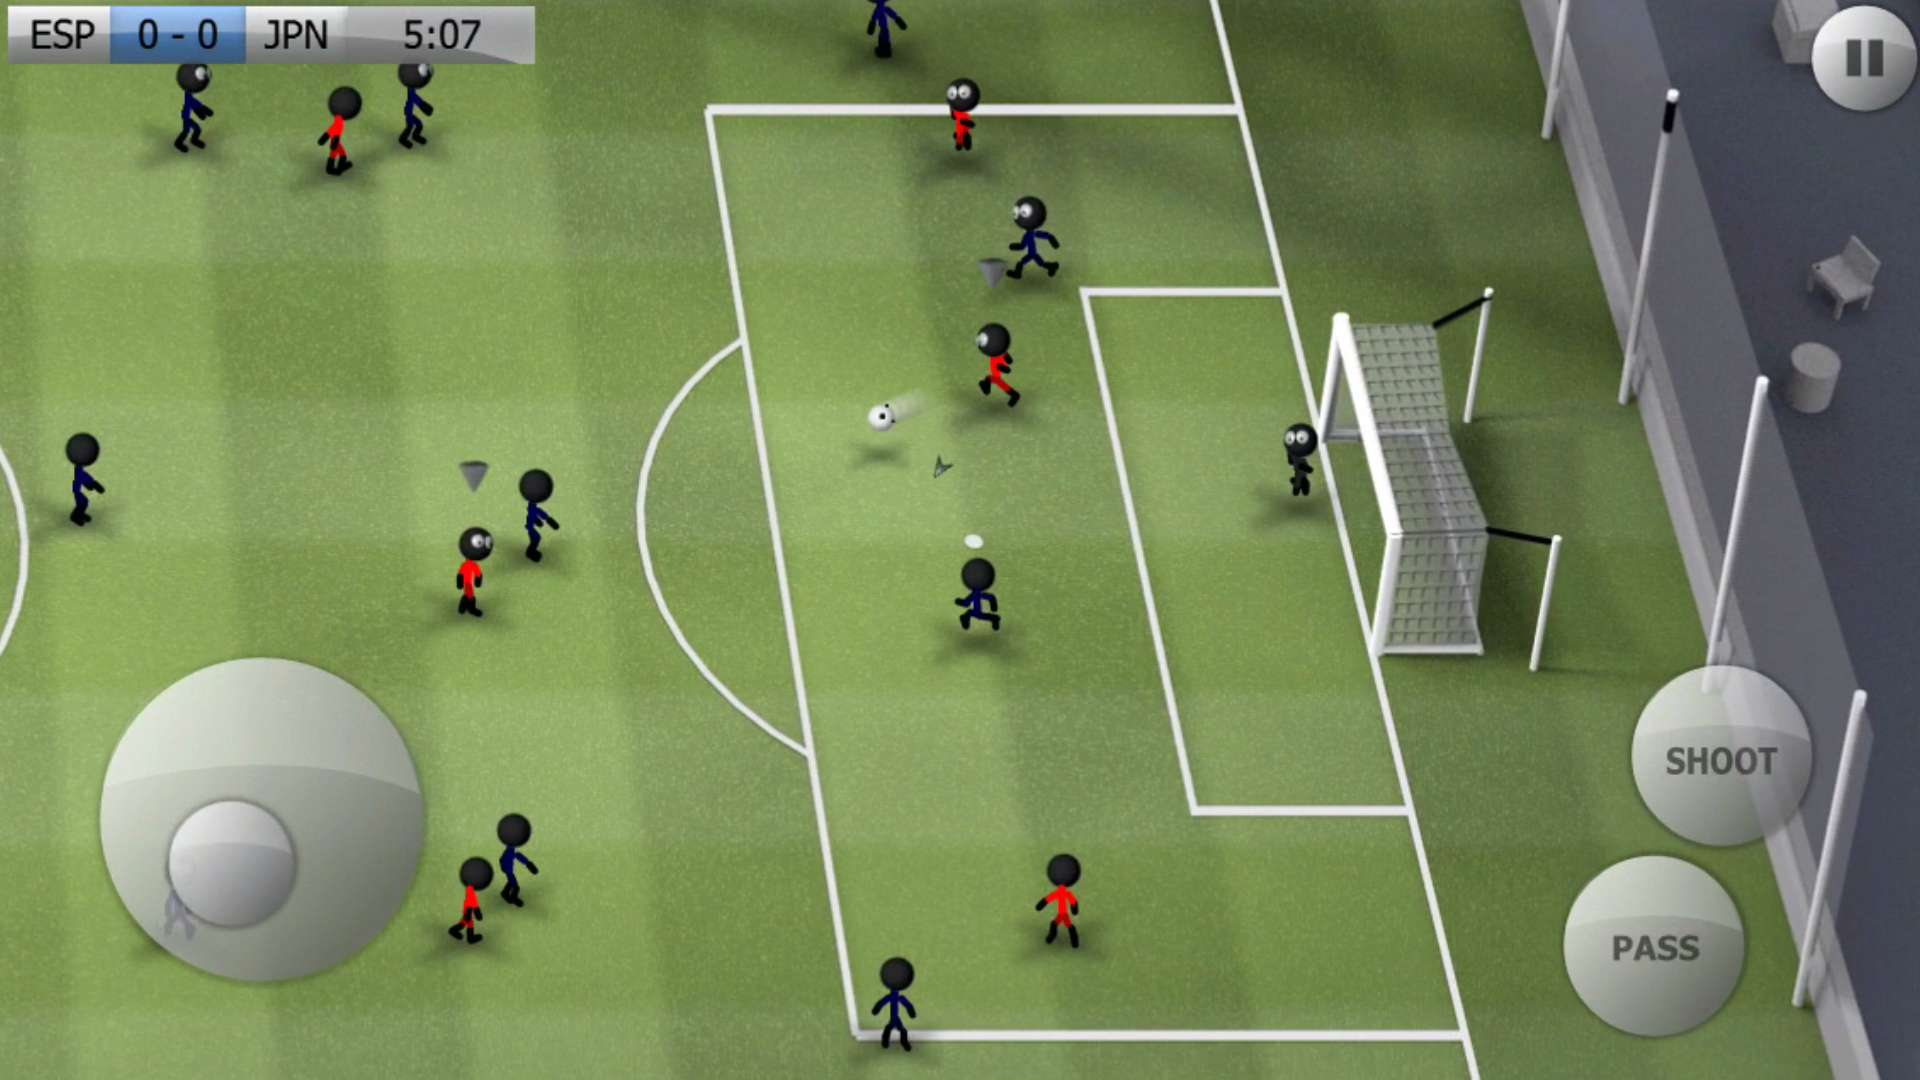 Stcikman Soccer